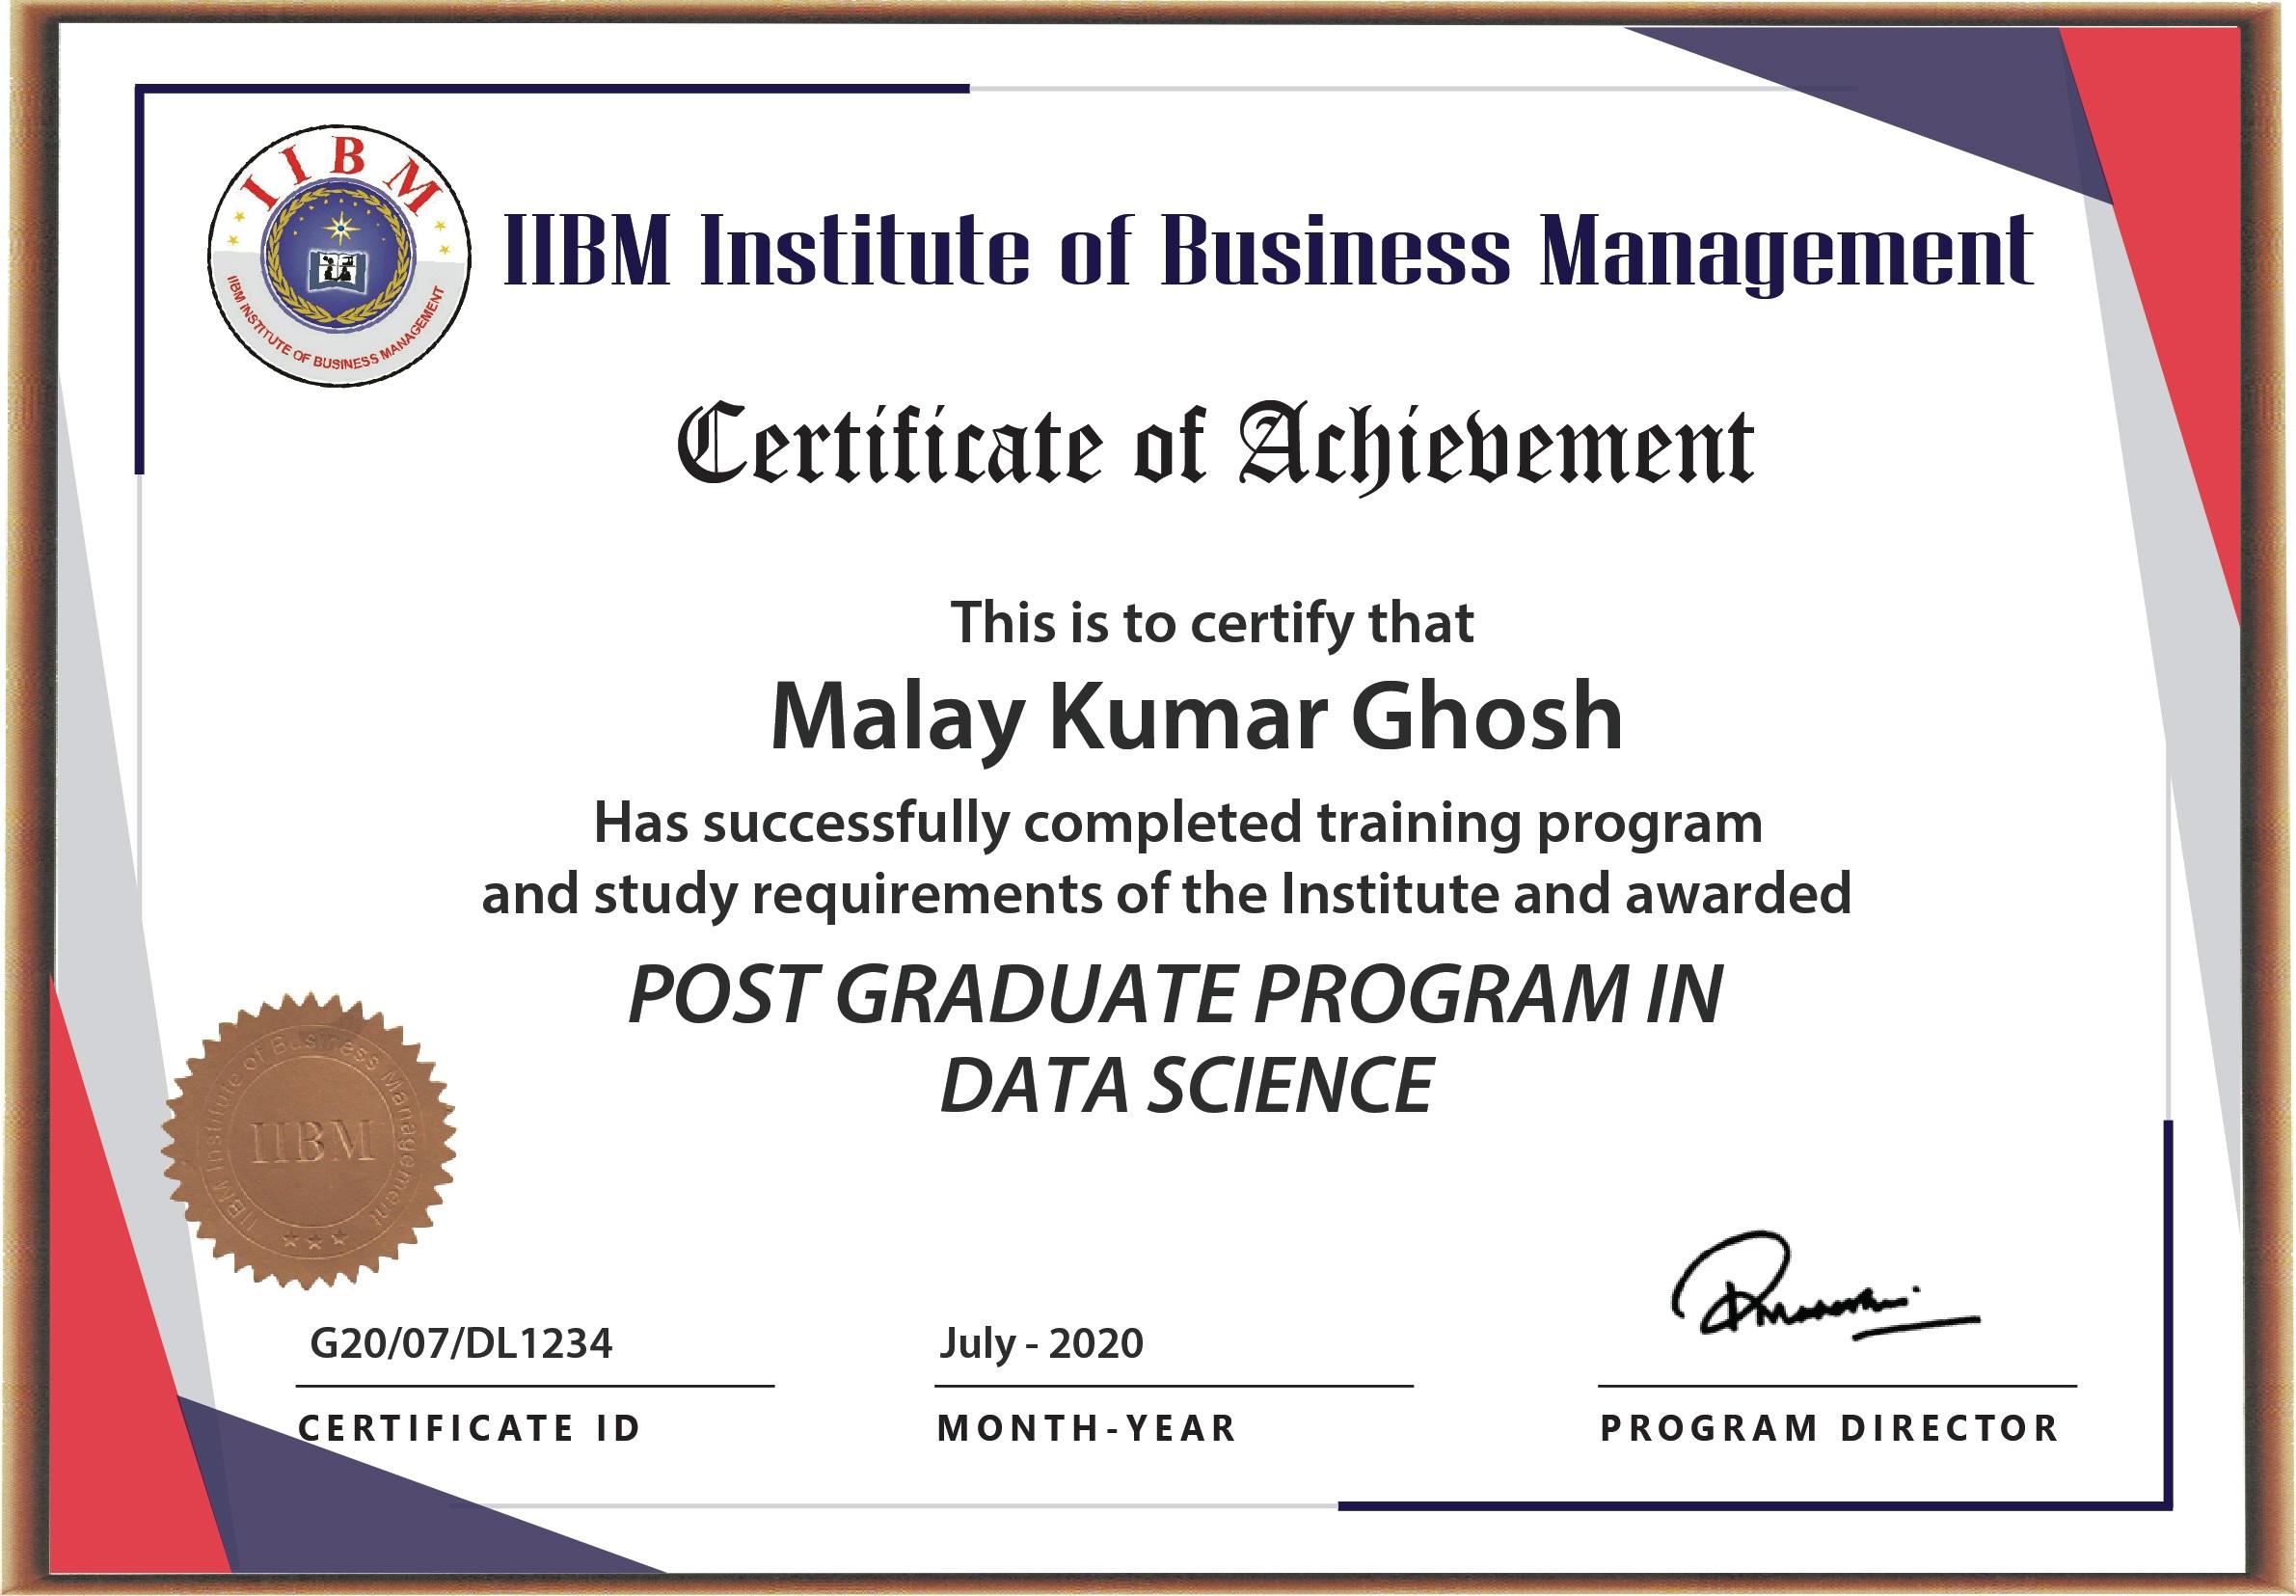 Online Certificate Programs in India, Online Professional Courses   IIBM India